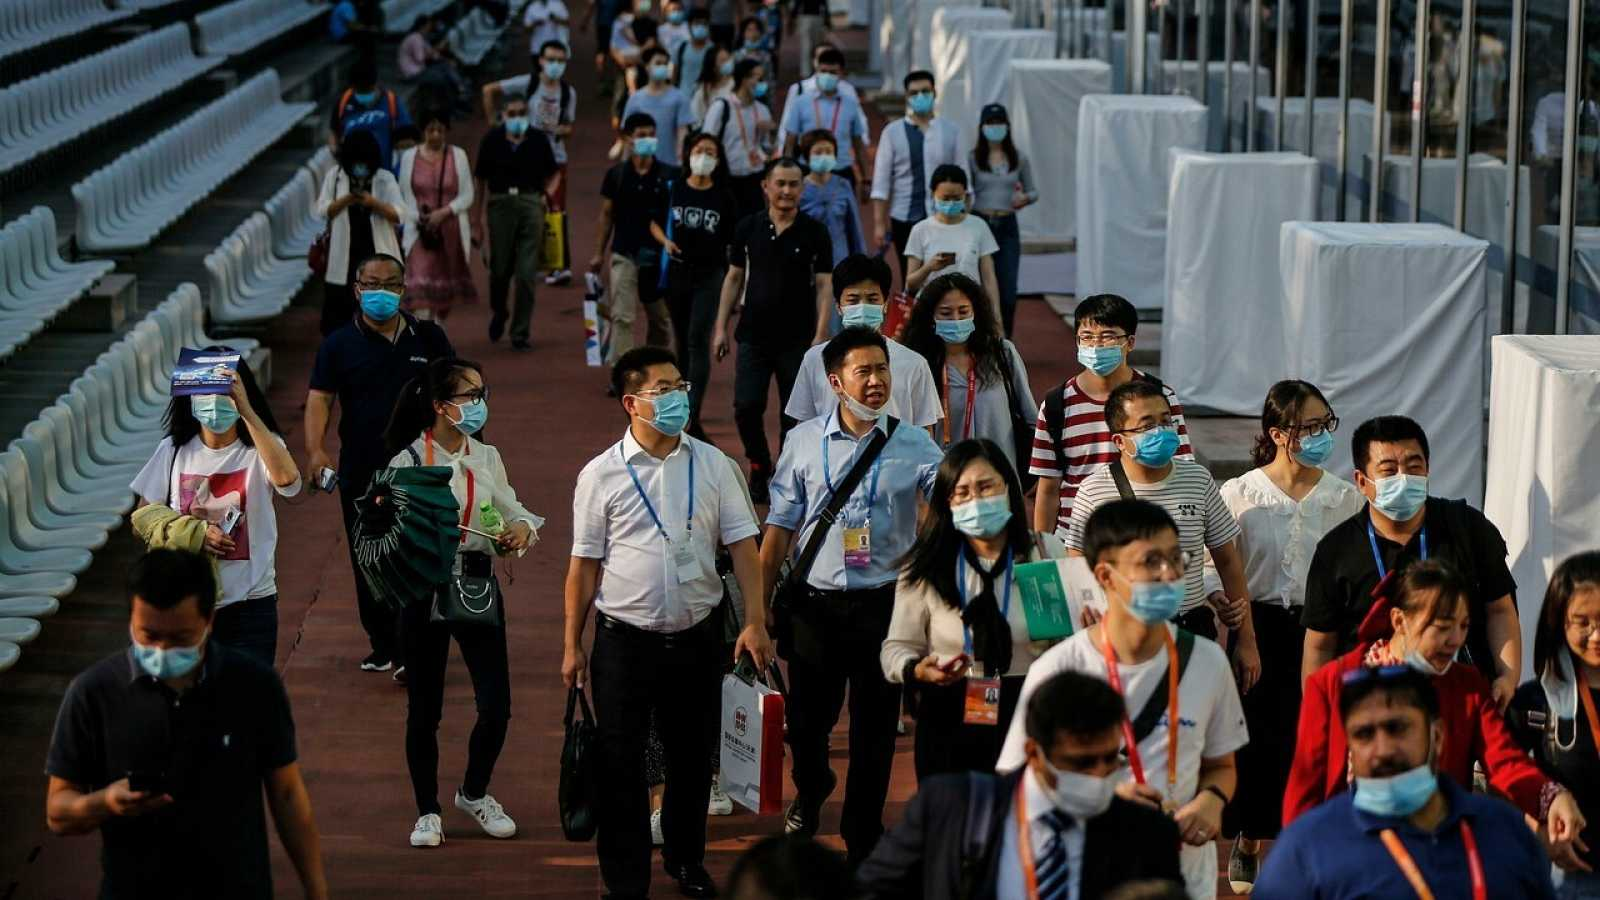 Asistentes a una feria internacional en Pekín. EFE/EPA/WU HONG